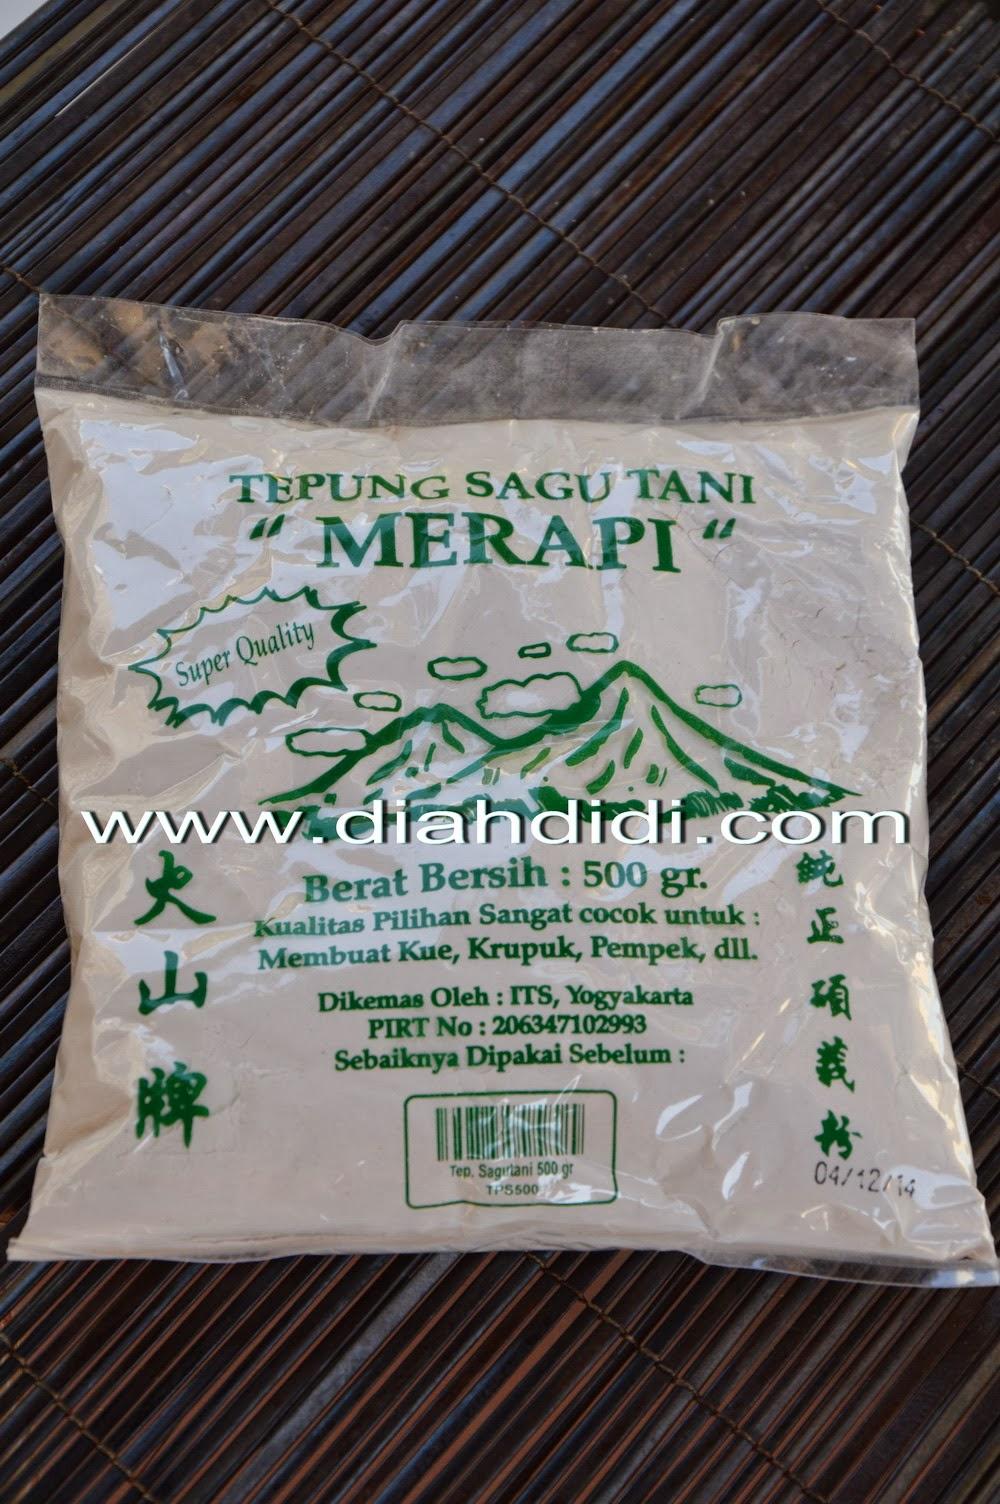 Apakah Tepung Tapioka Sama Dengan Tepung Sagu : apakah, tepung, tapioka, dengan, Didi's, Kitchen:, Tepung, Versus, Tapioka